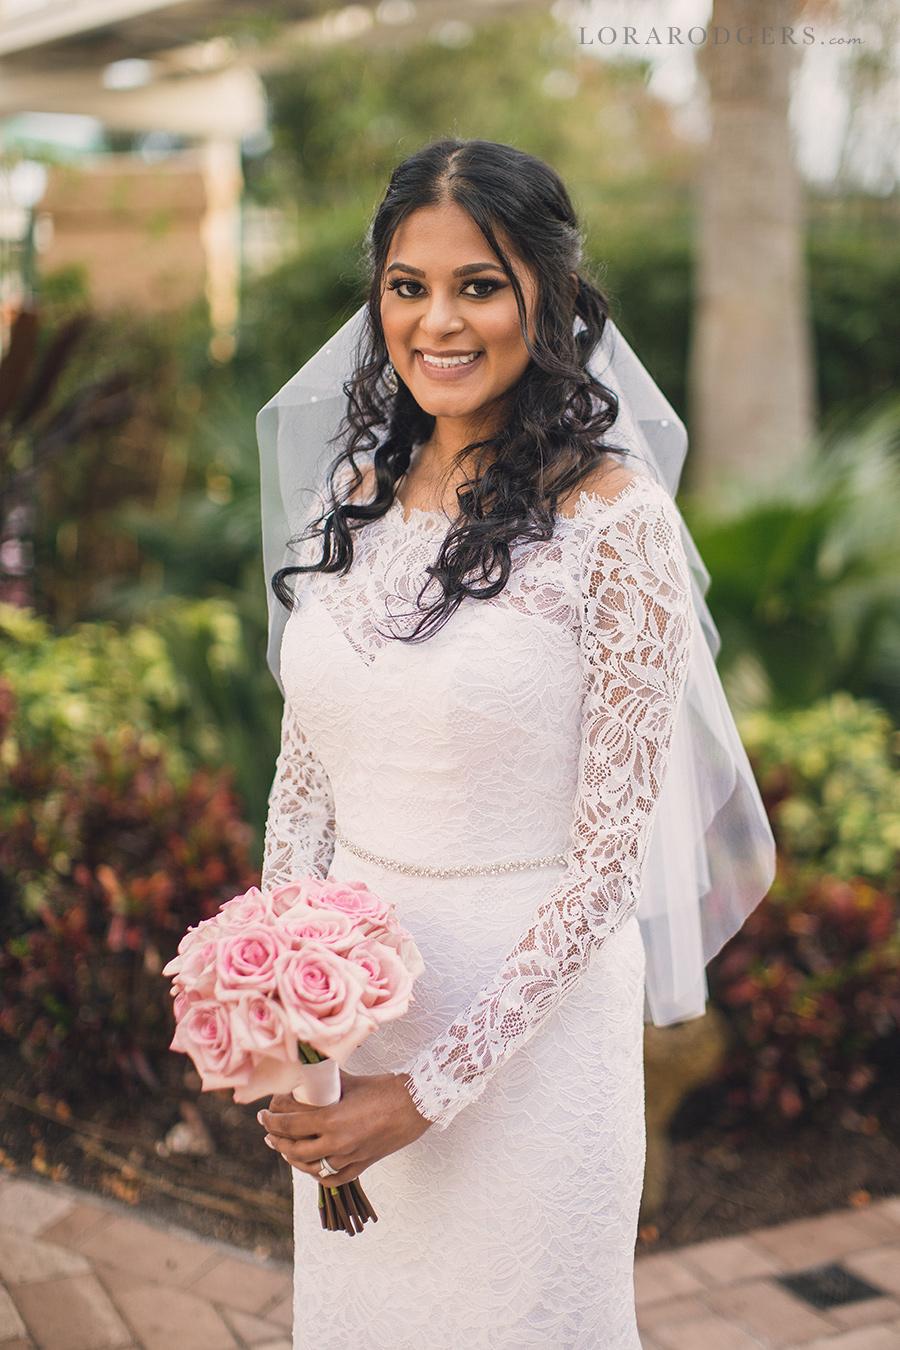 Rosen_Plaza_Orlando_Wedding_050